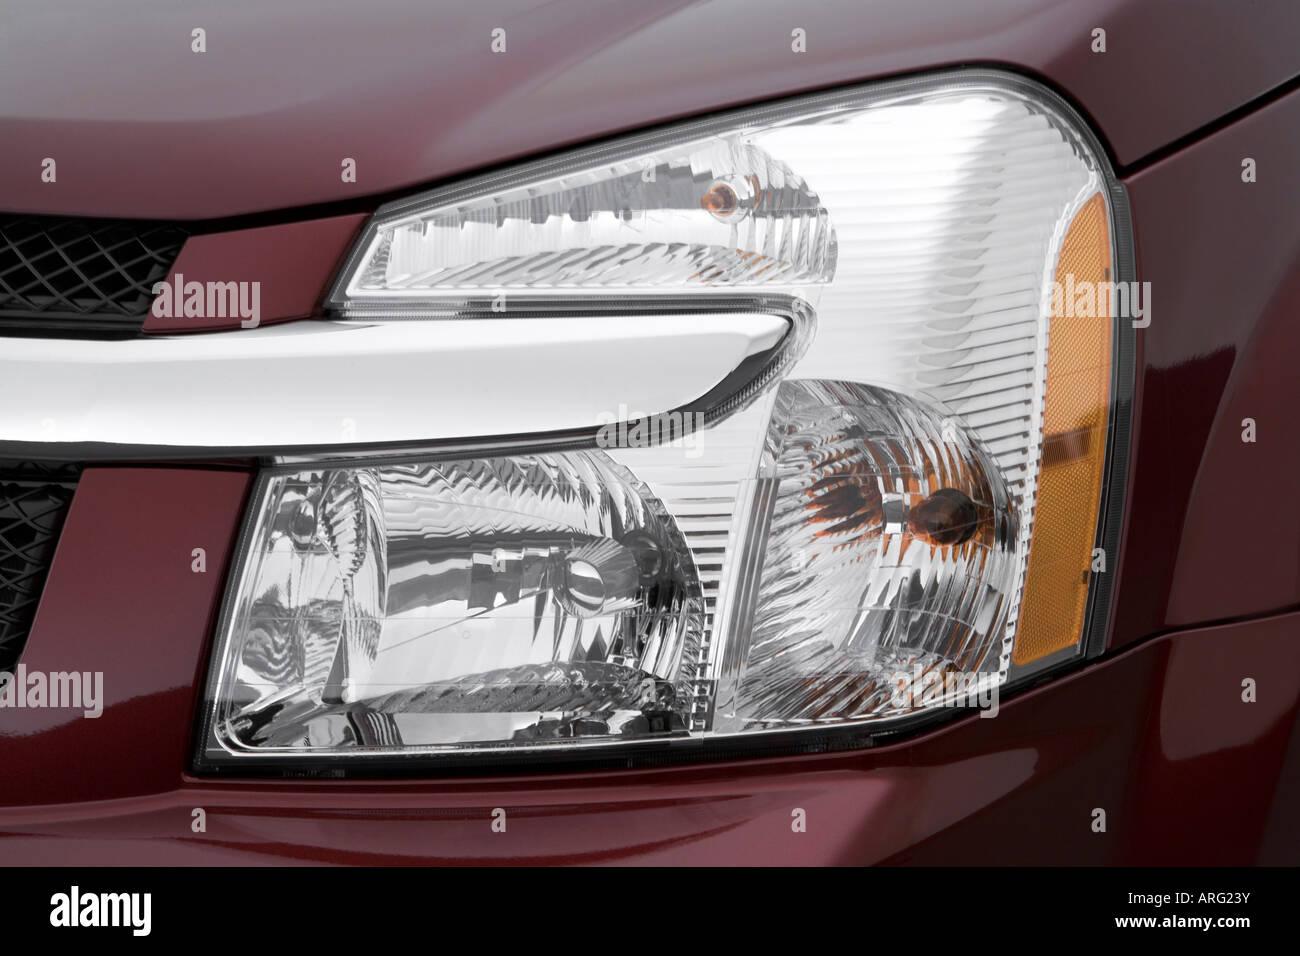 2007 Chevrolet Equinox Lt In Red Headlight Stock Photo Alamy